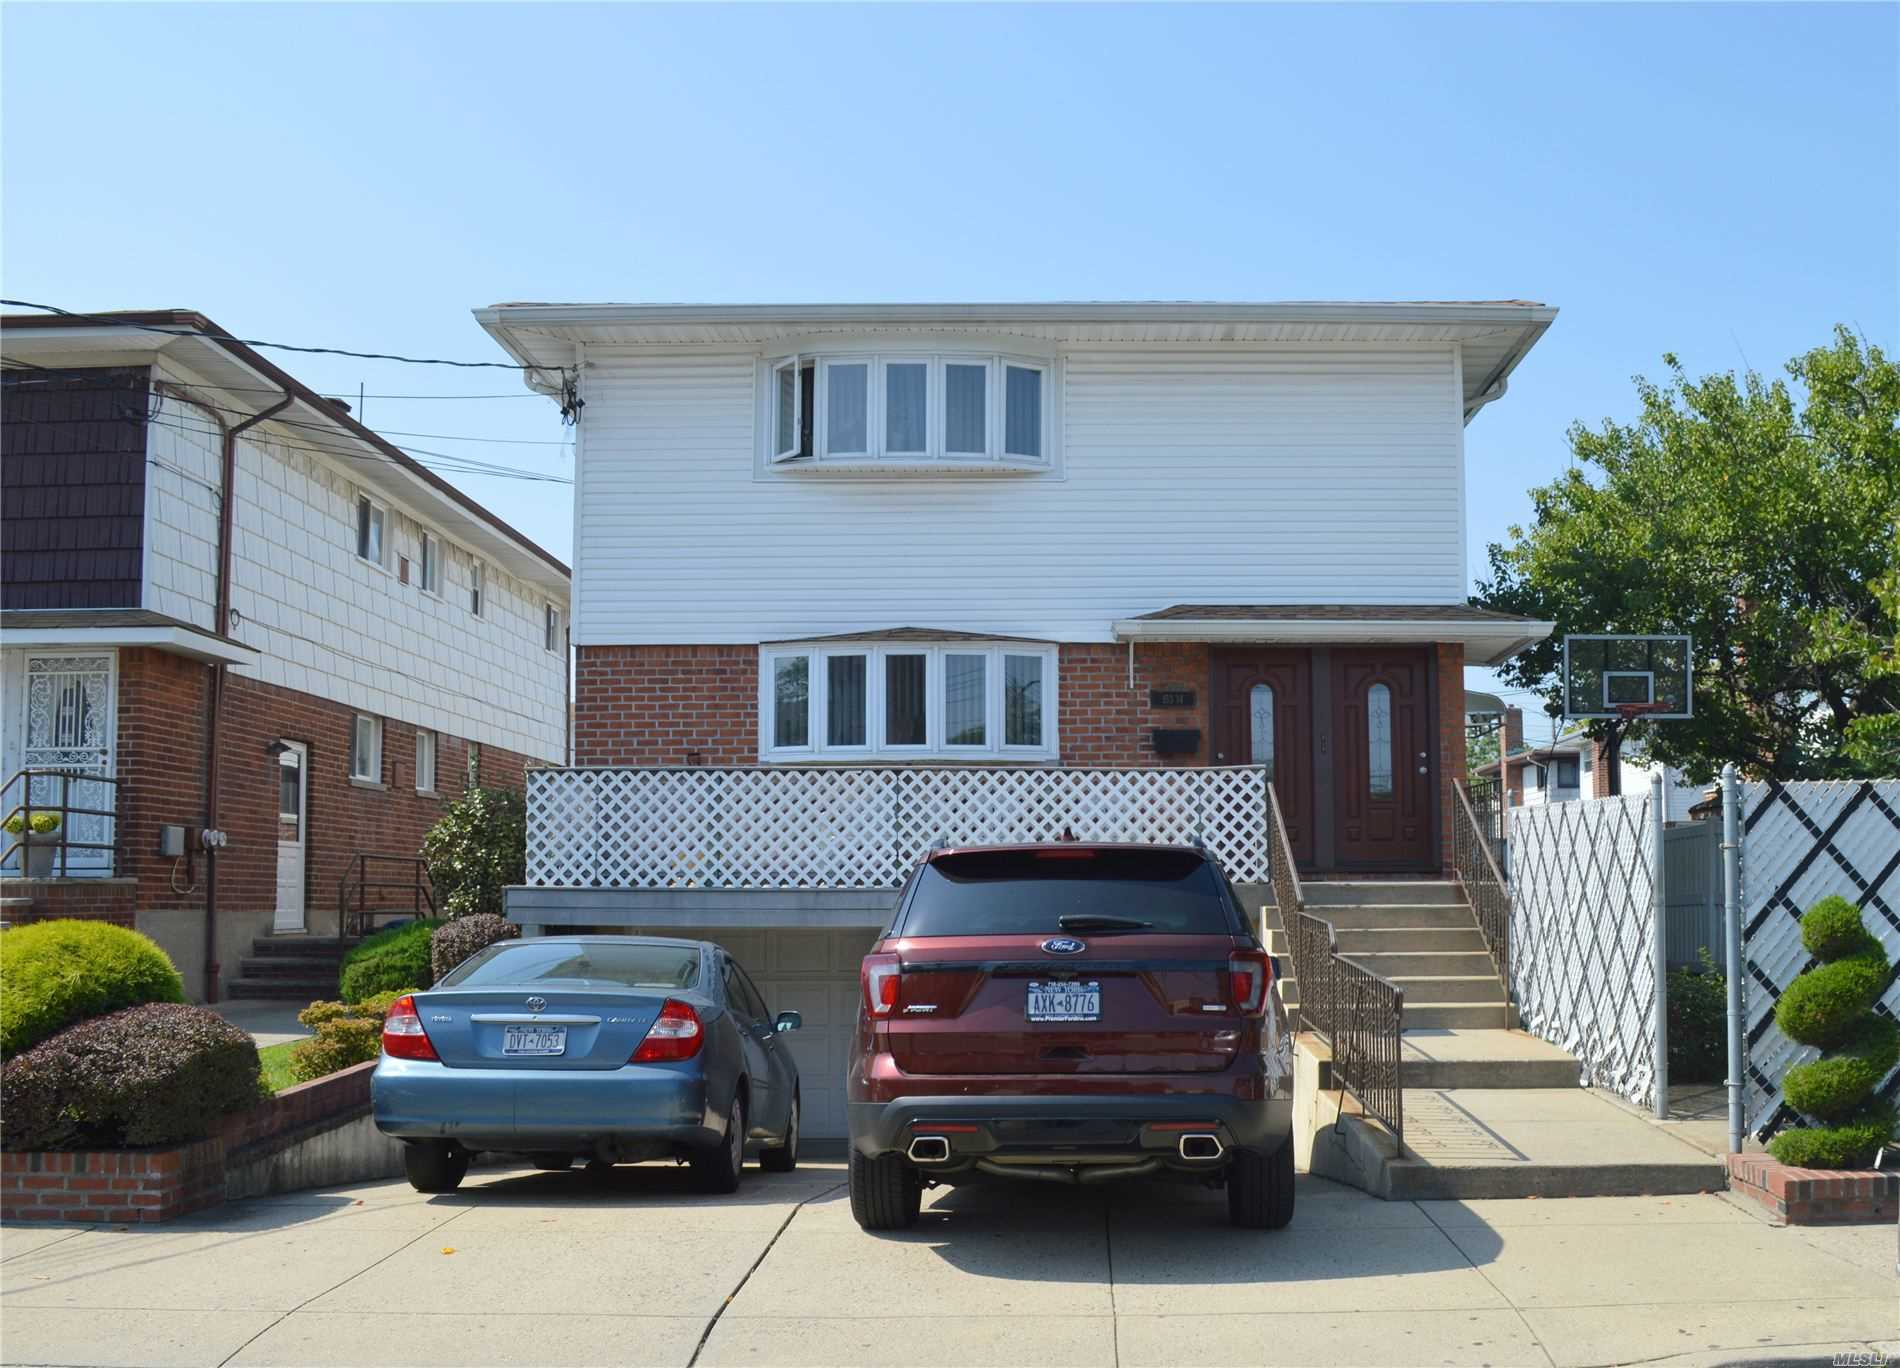 Property for sale at 153-14 82nd Street, Howard Beach NY 11414, Howard Beach,  New York 11414